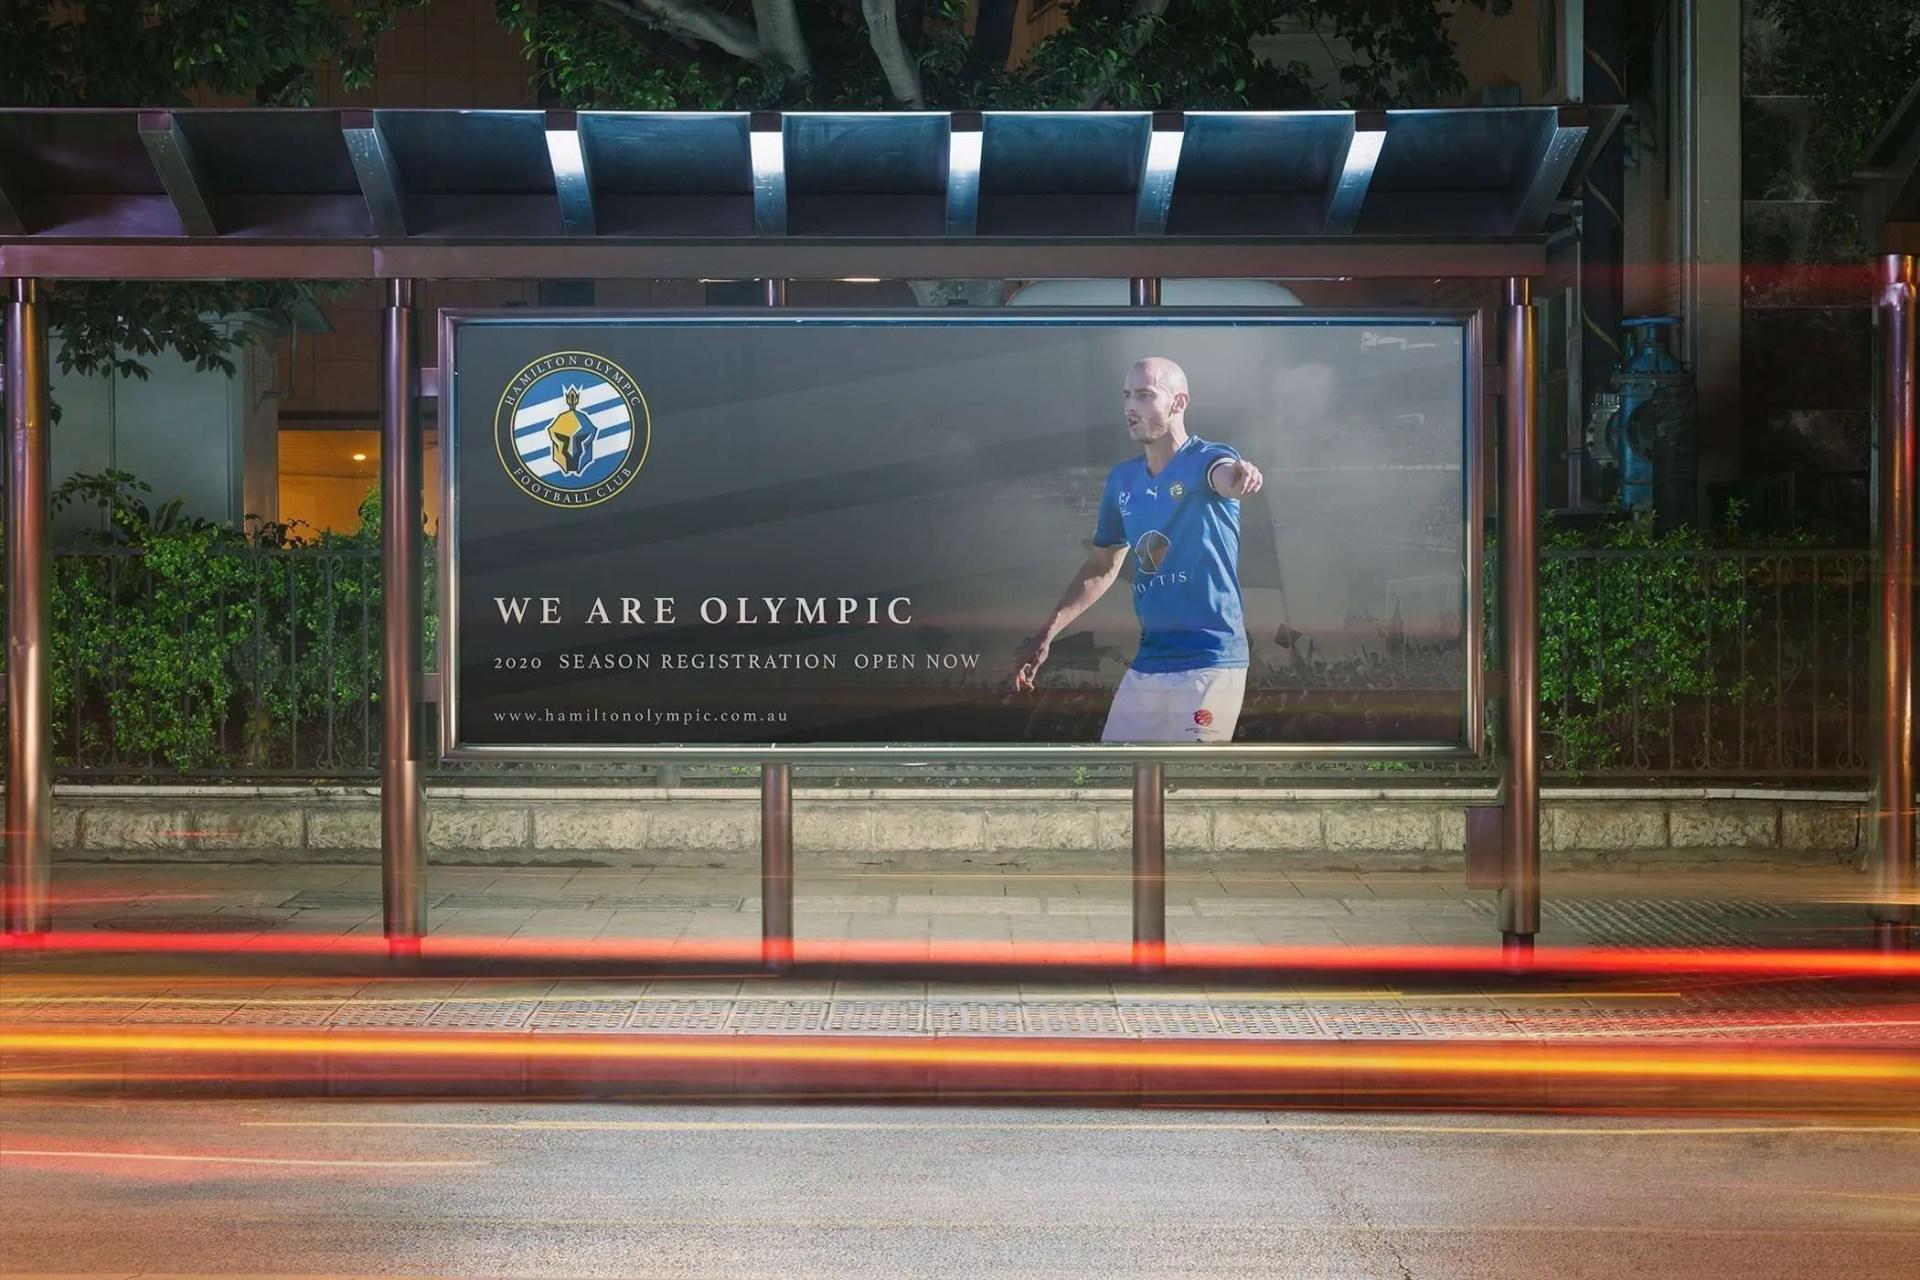 Hamilton_Olympic_Bus_Stop